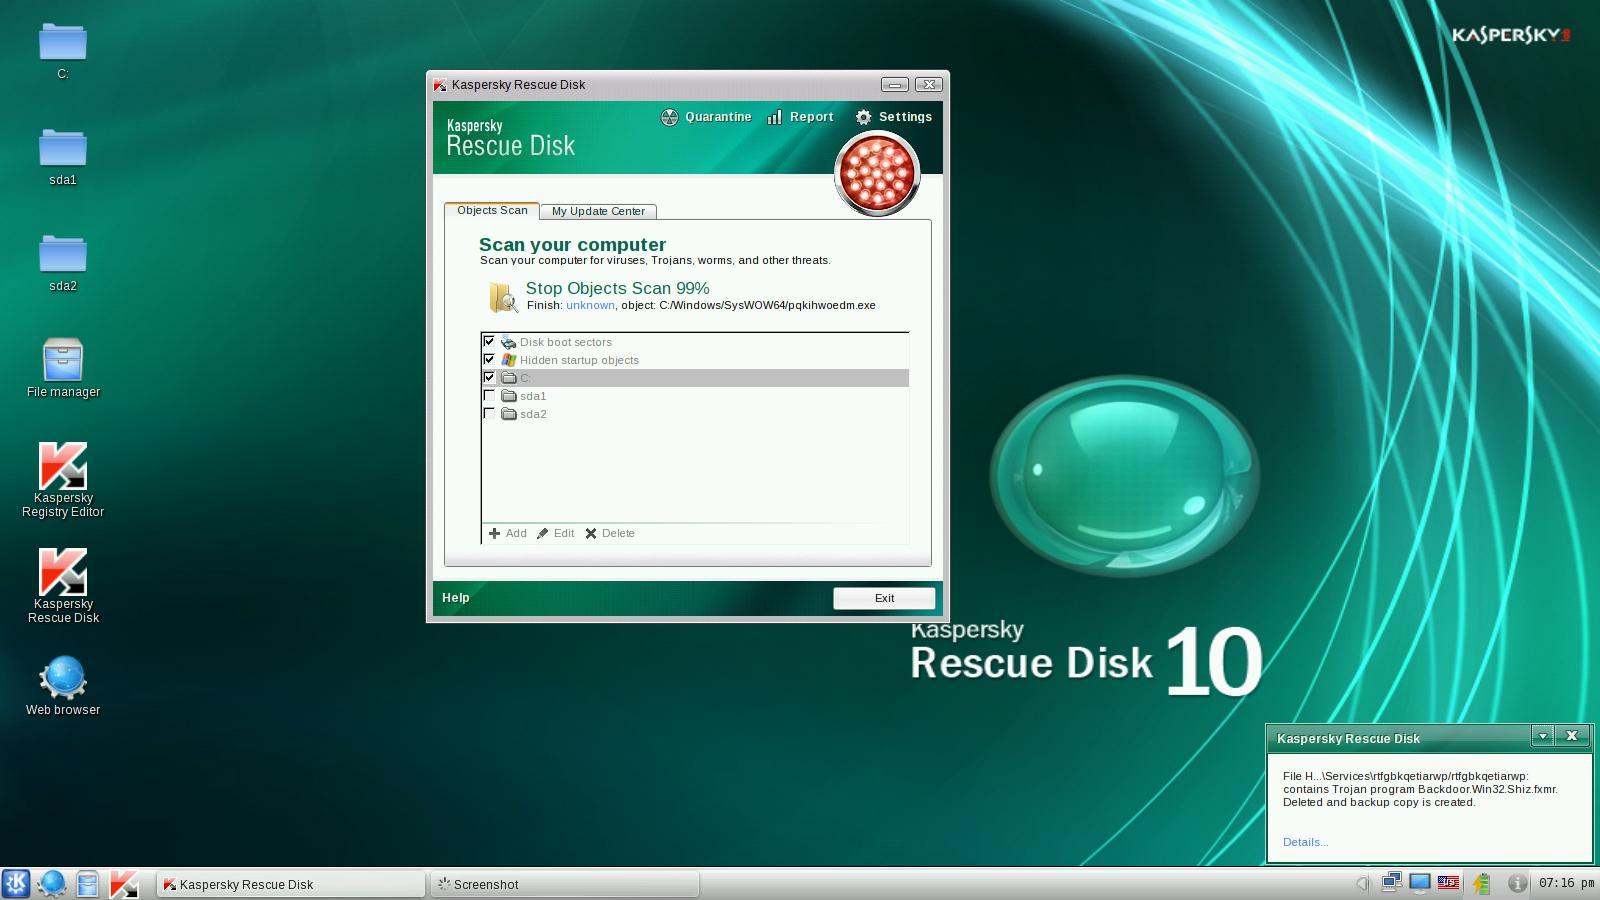 Hướng dẫn tạo USB Kaspersky Rescue Disk 10